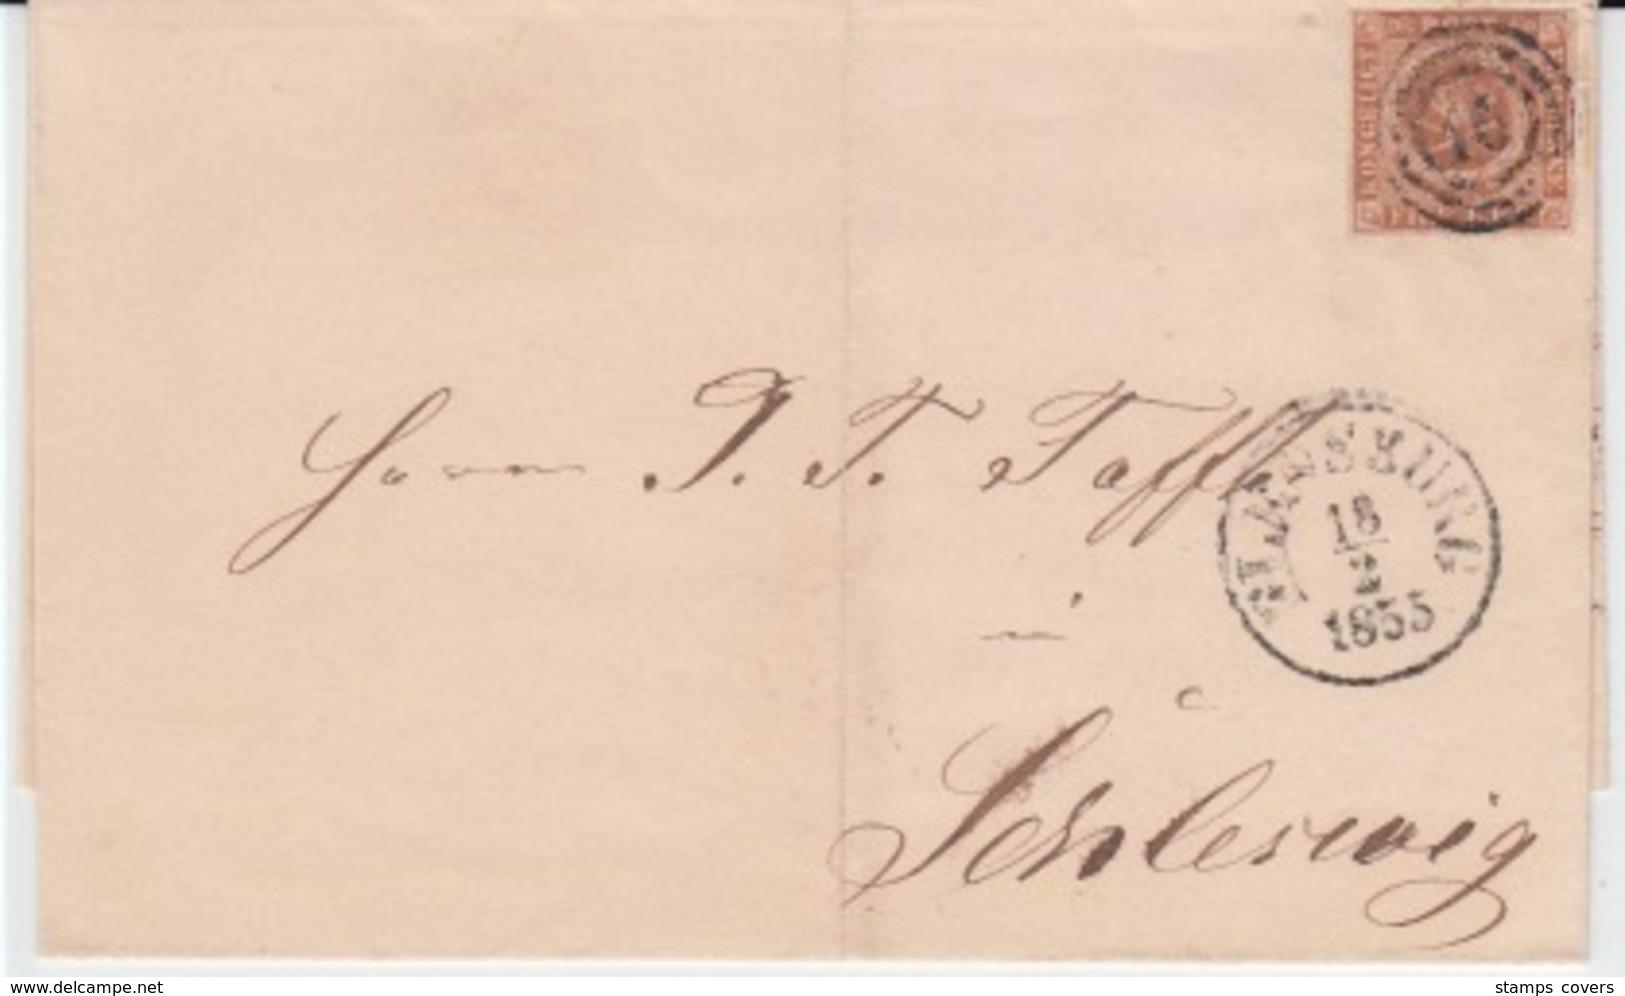 DENMARK MICHEL 1 USED COVER 18/02/1855 FLENSBORG (FLENSBOURG) TO SLESVIG (SCHLESWIG)) - Covers & Documents